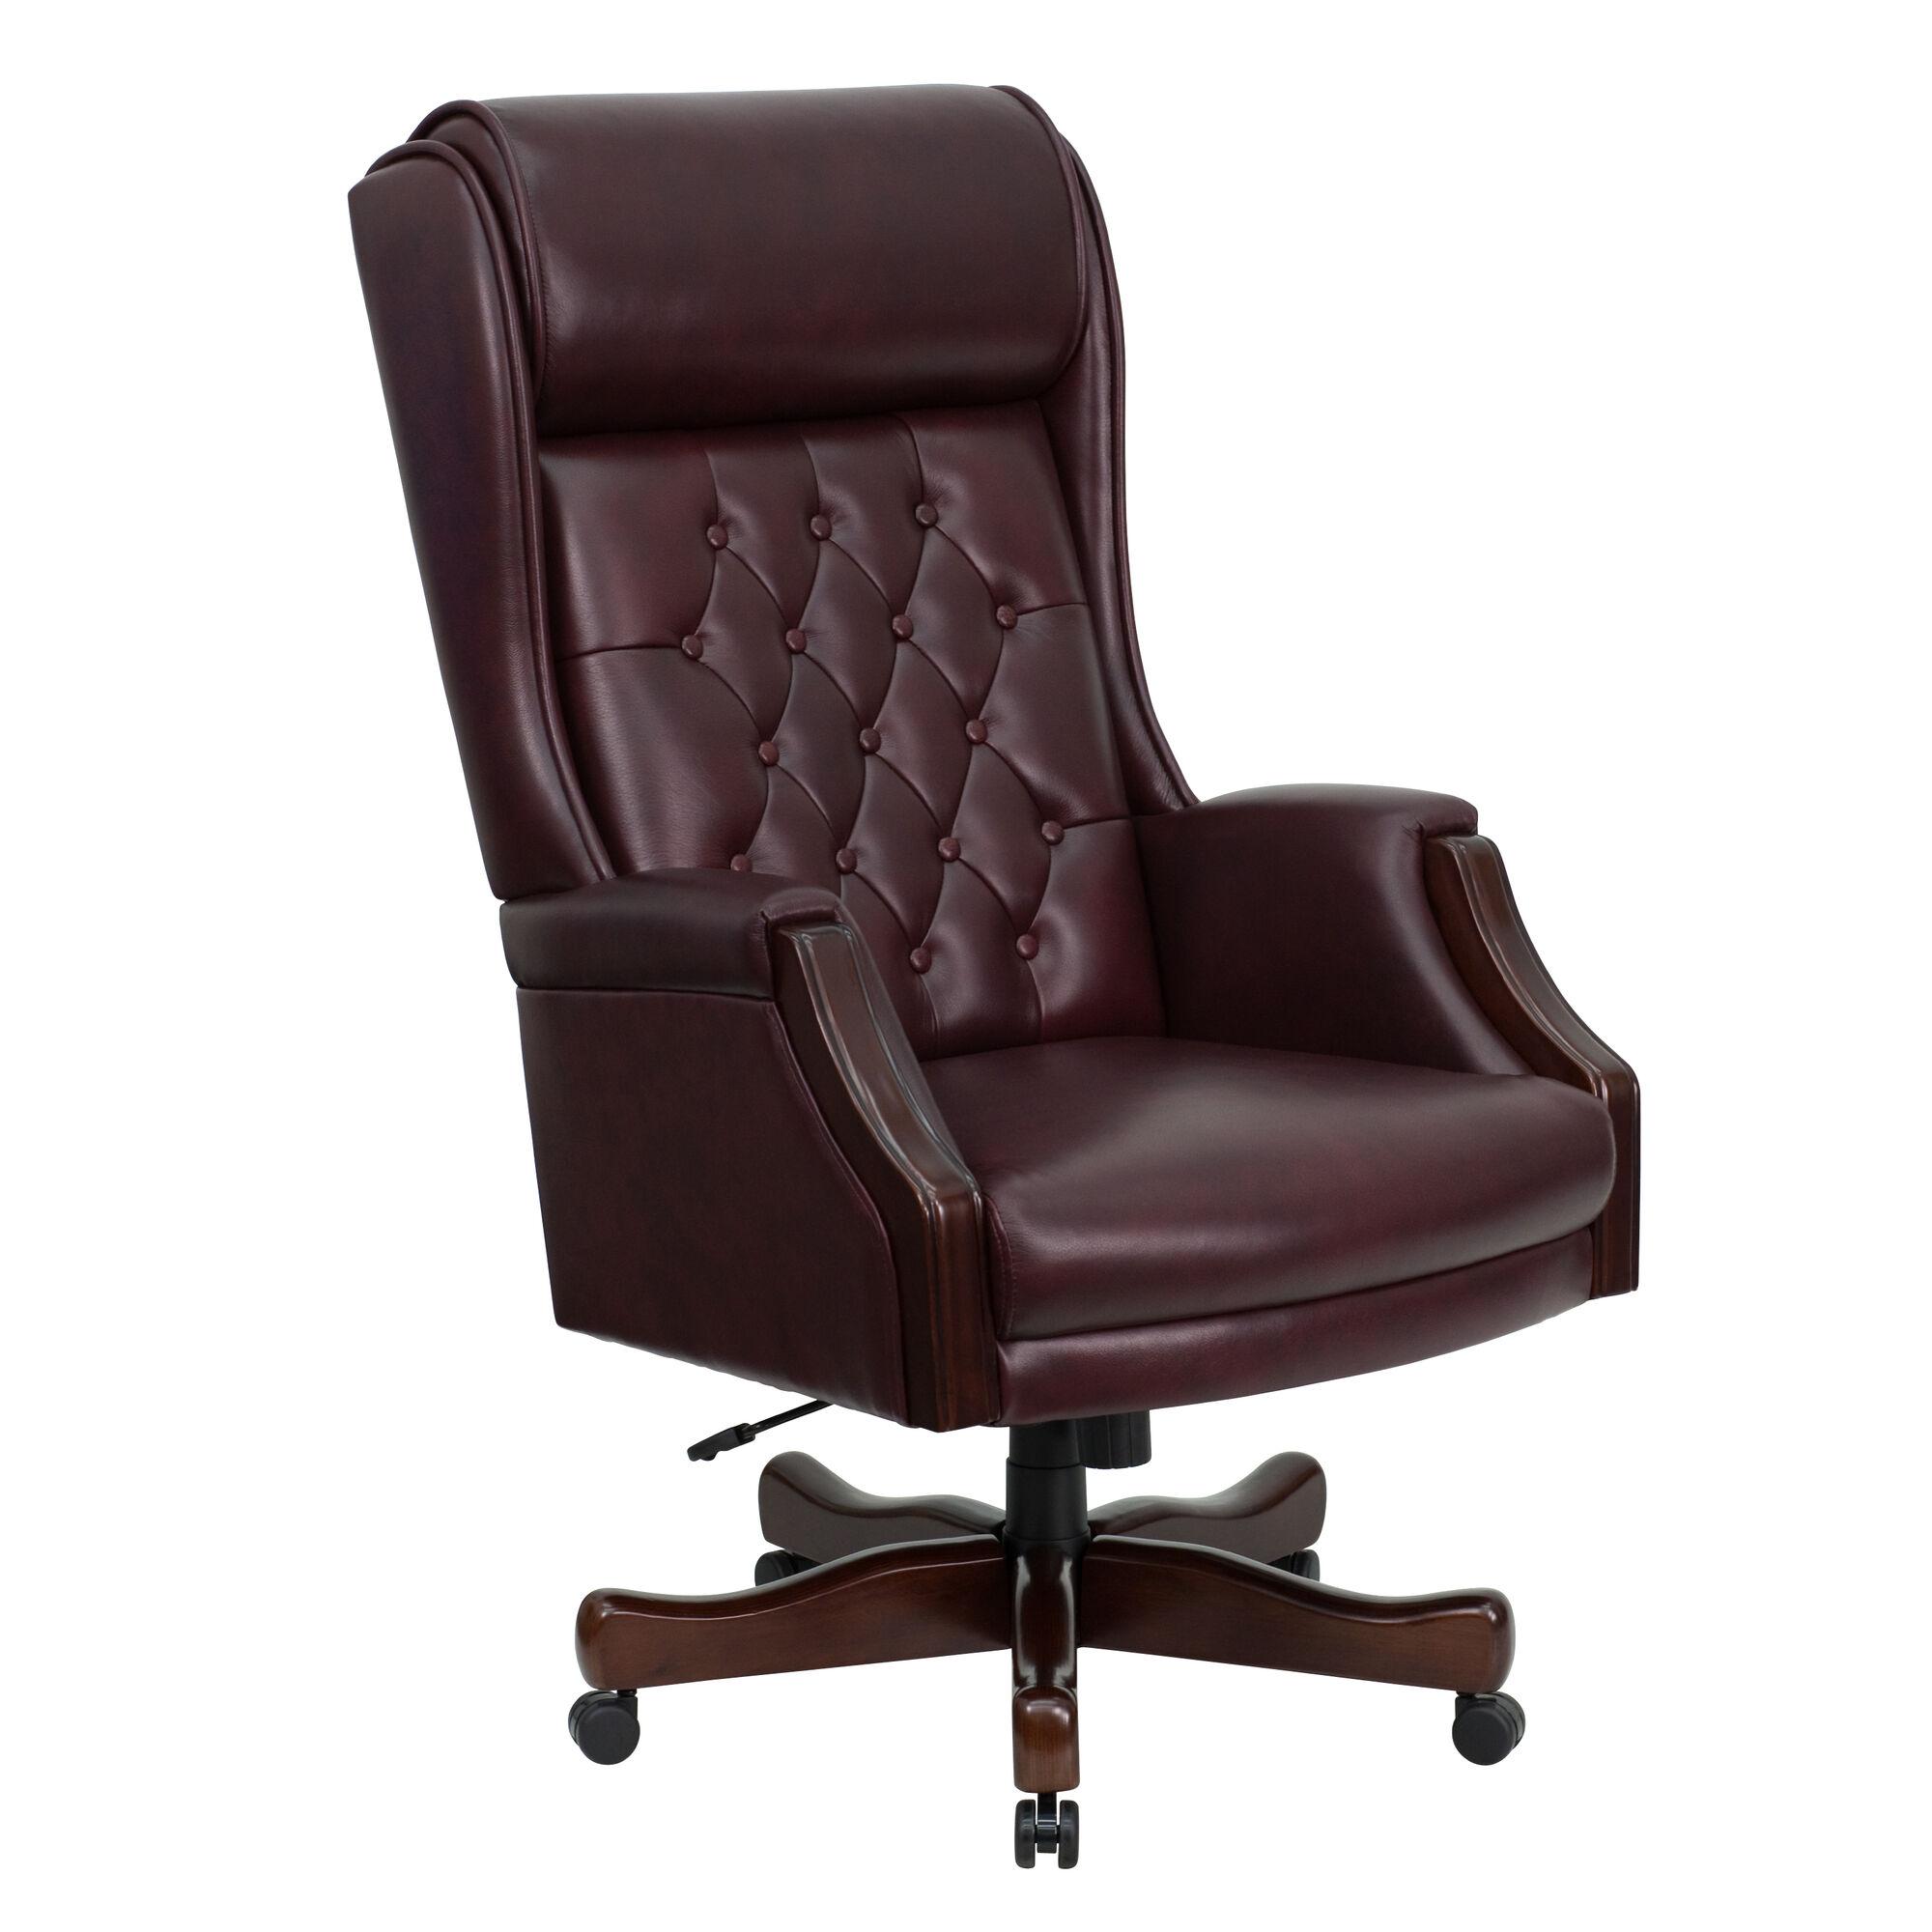 Flash Furniture KC C696TG GG at Bizchair